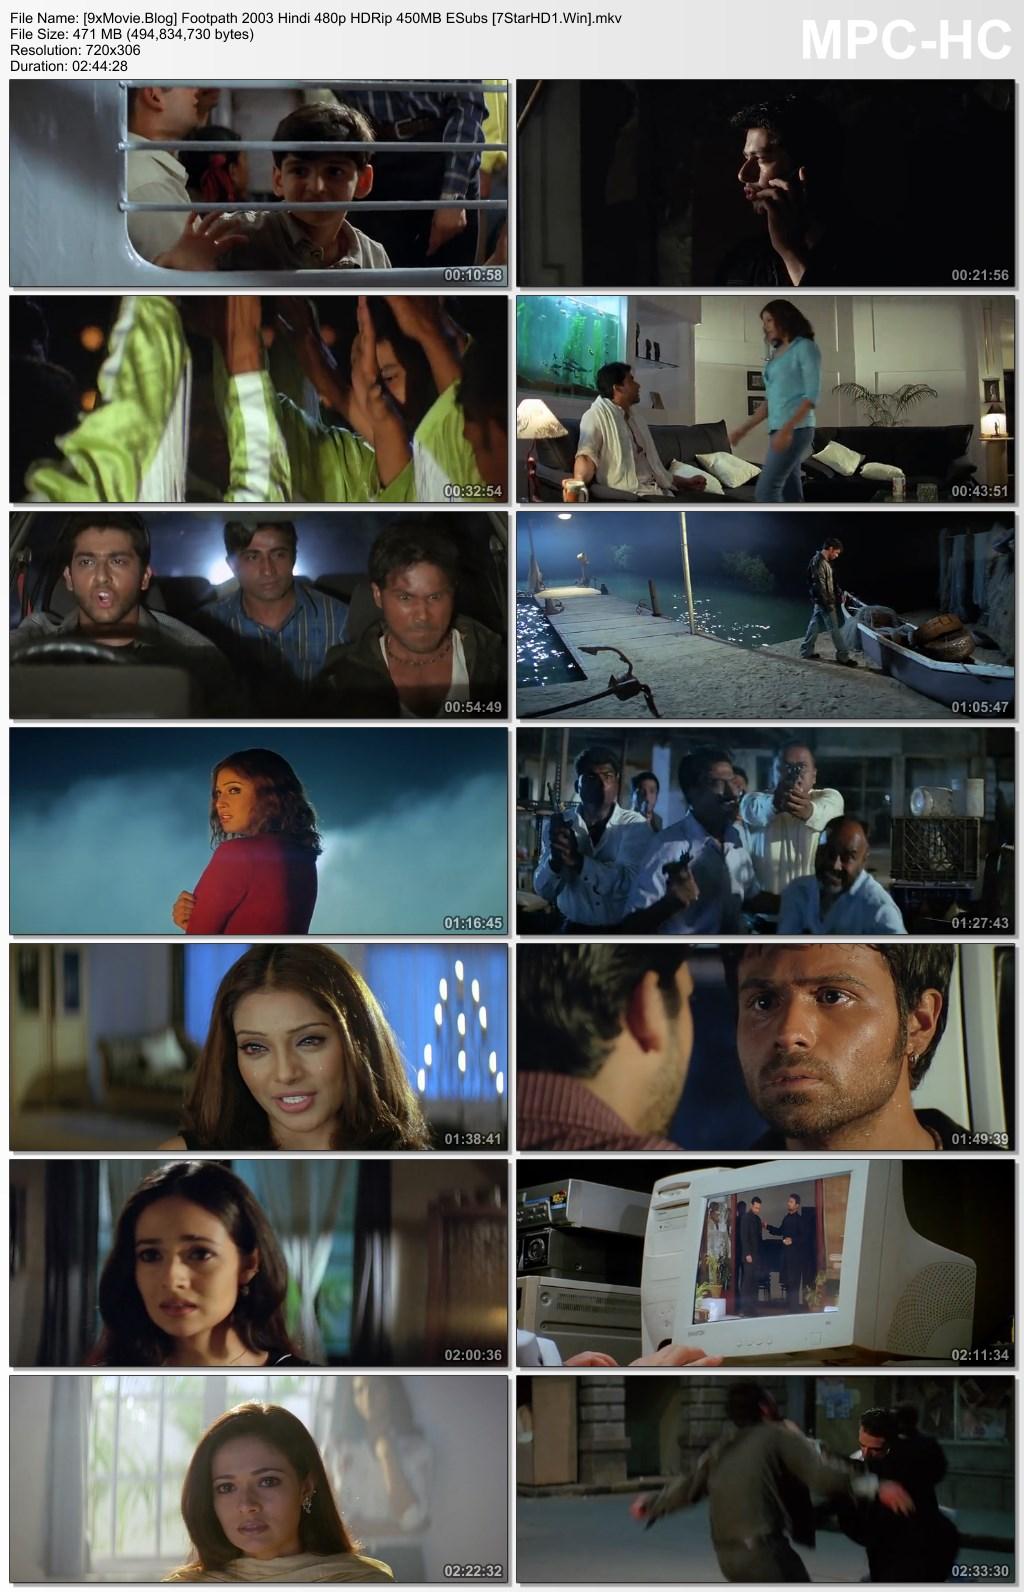 Footpath 2003 Hindi 480p HDRip x264 450MB ESubs